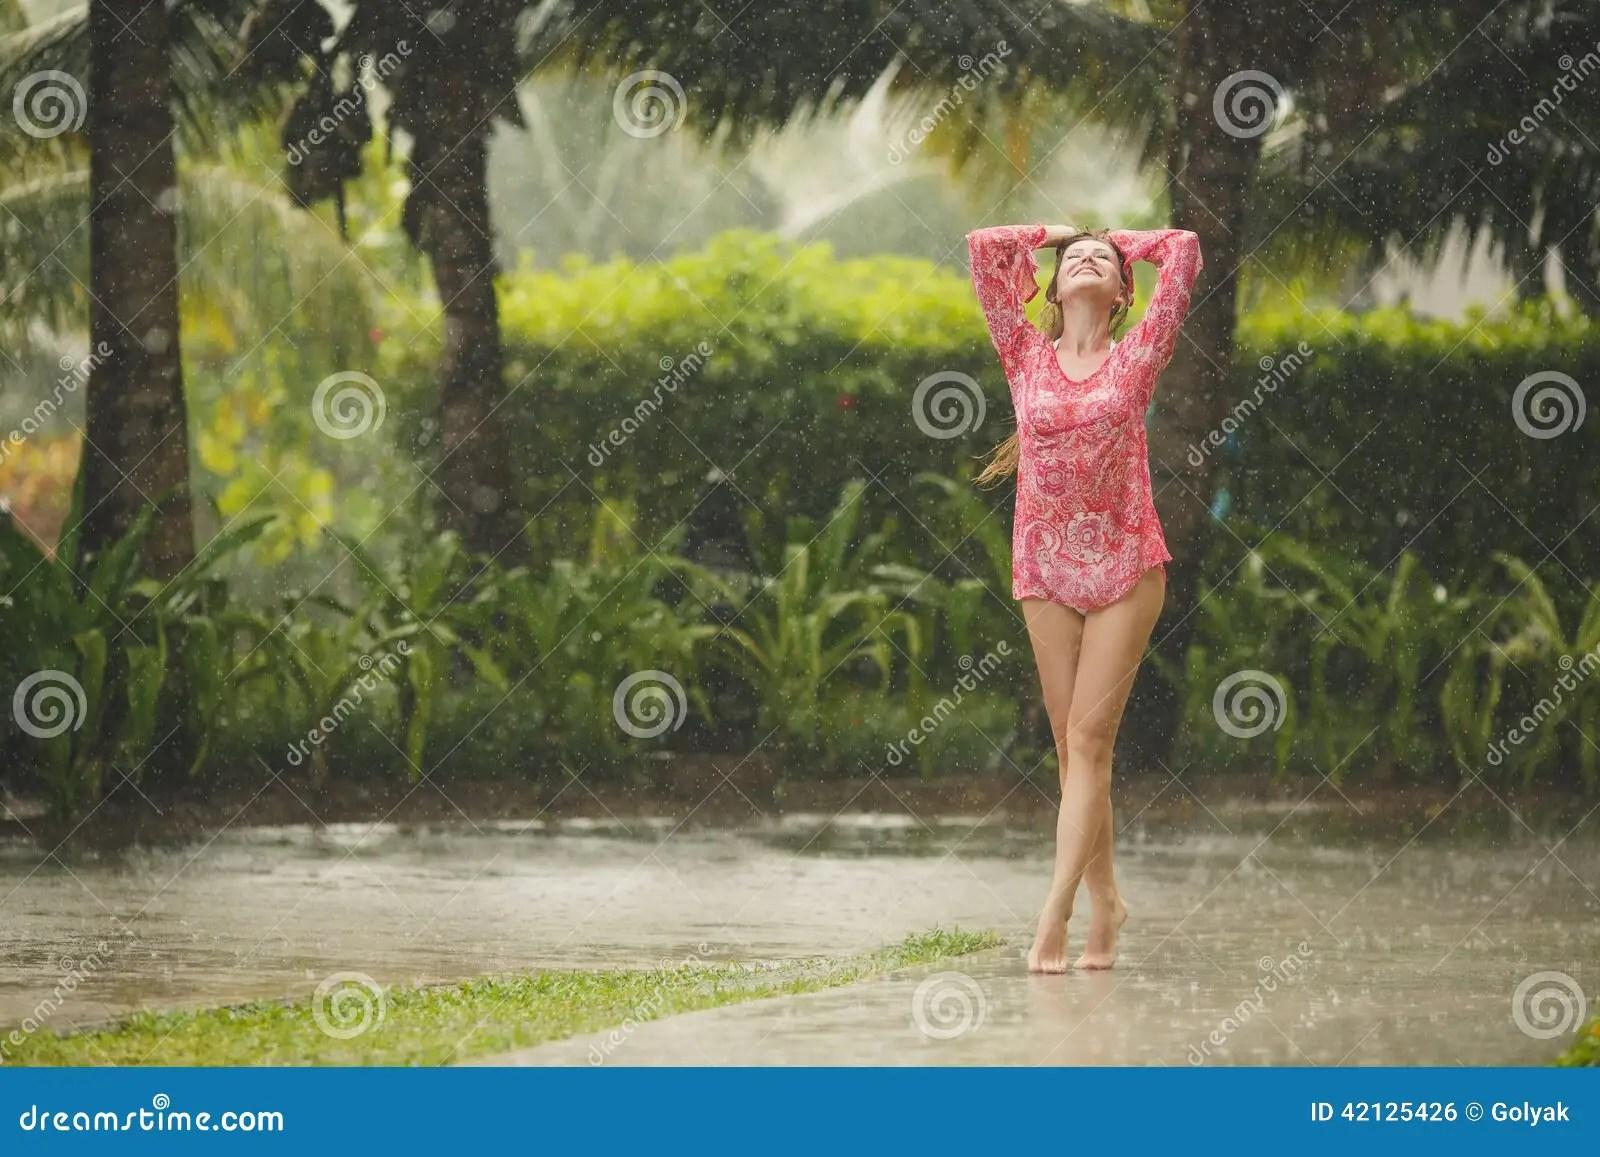 Rainy Fall Day Wallpaper Portrait Of Beautiful Woman Under The Tropical Rain Stock